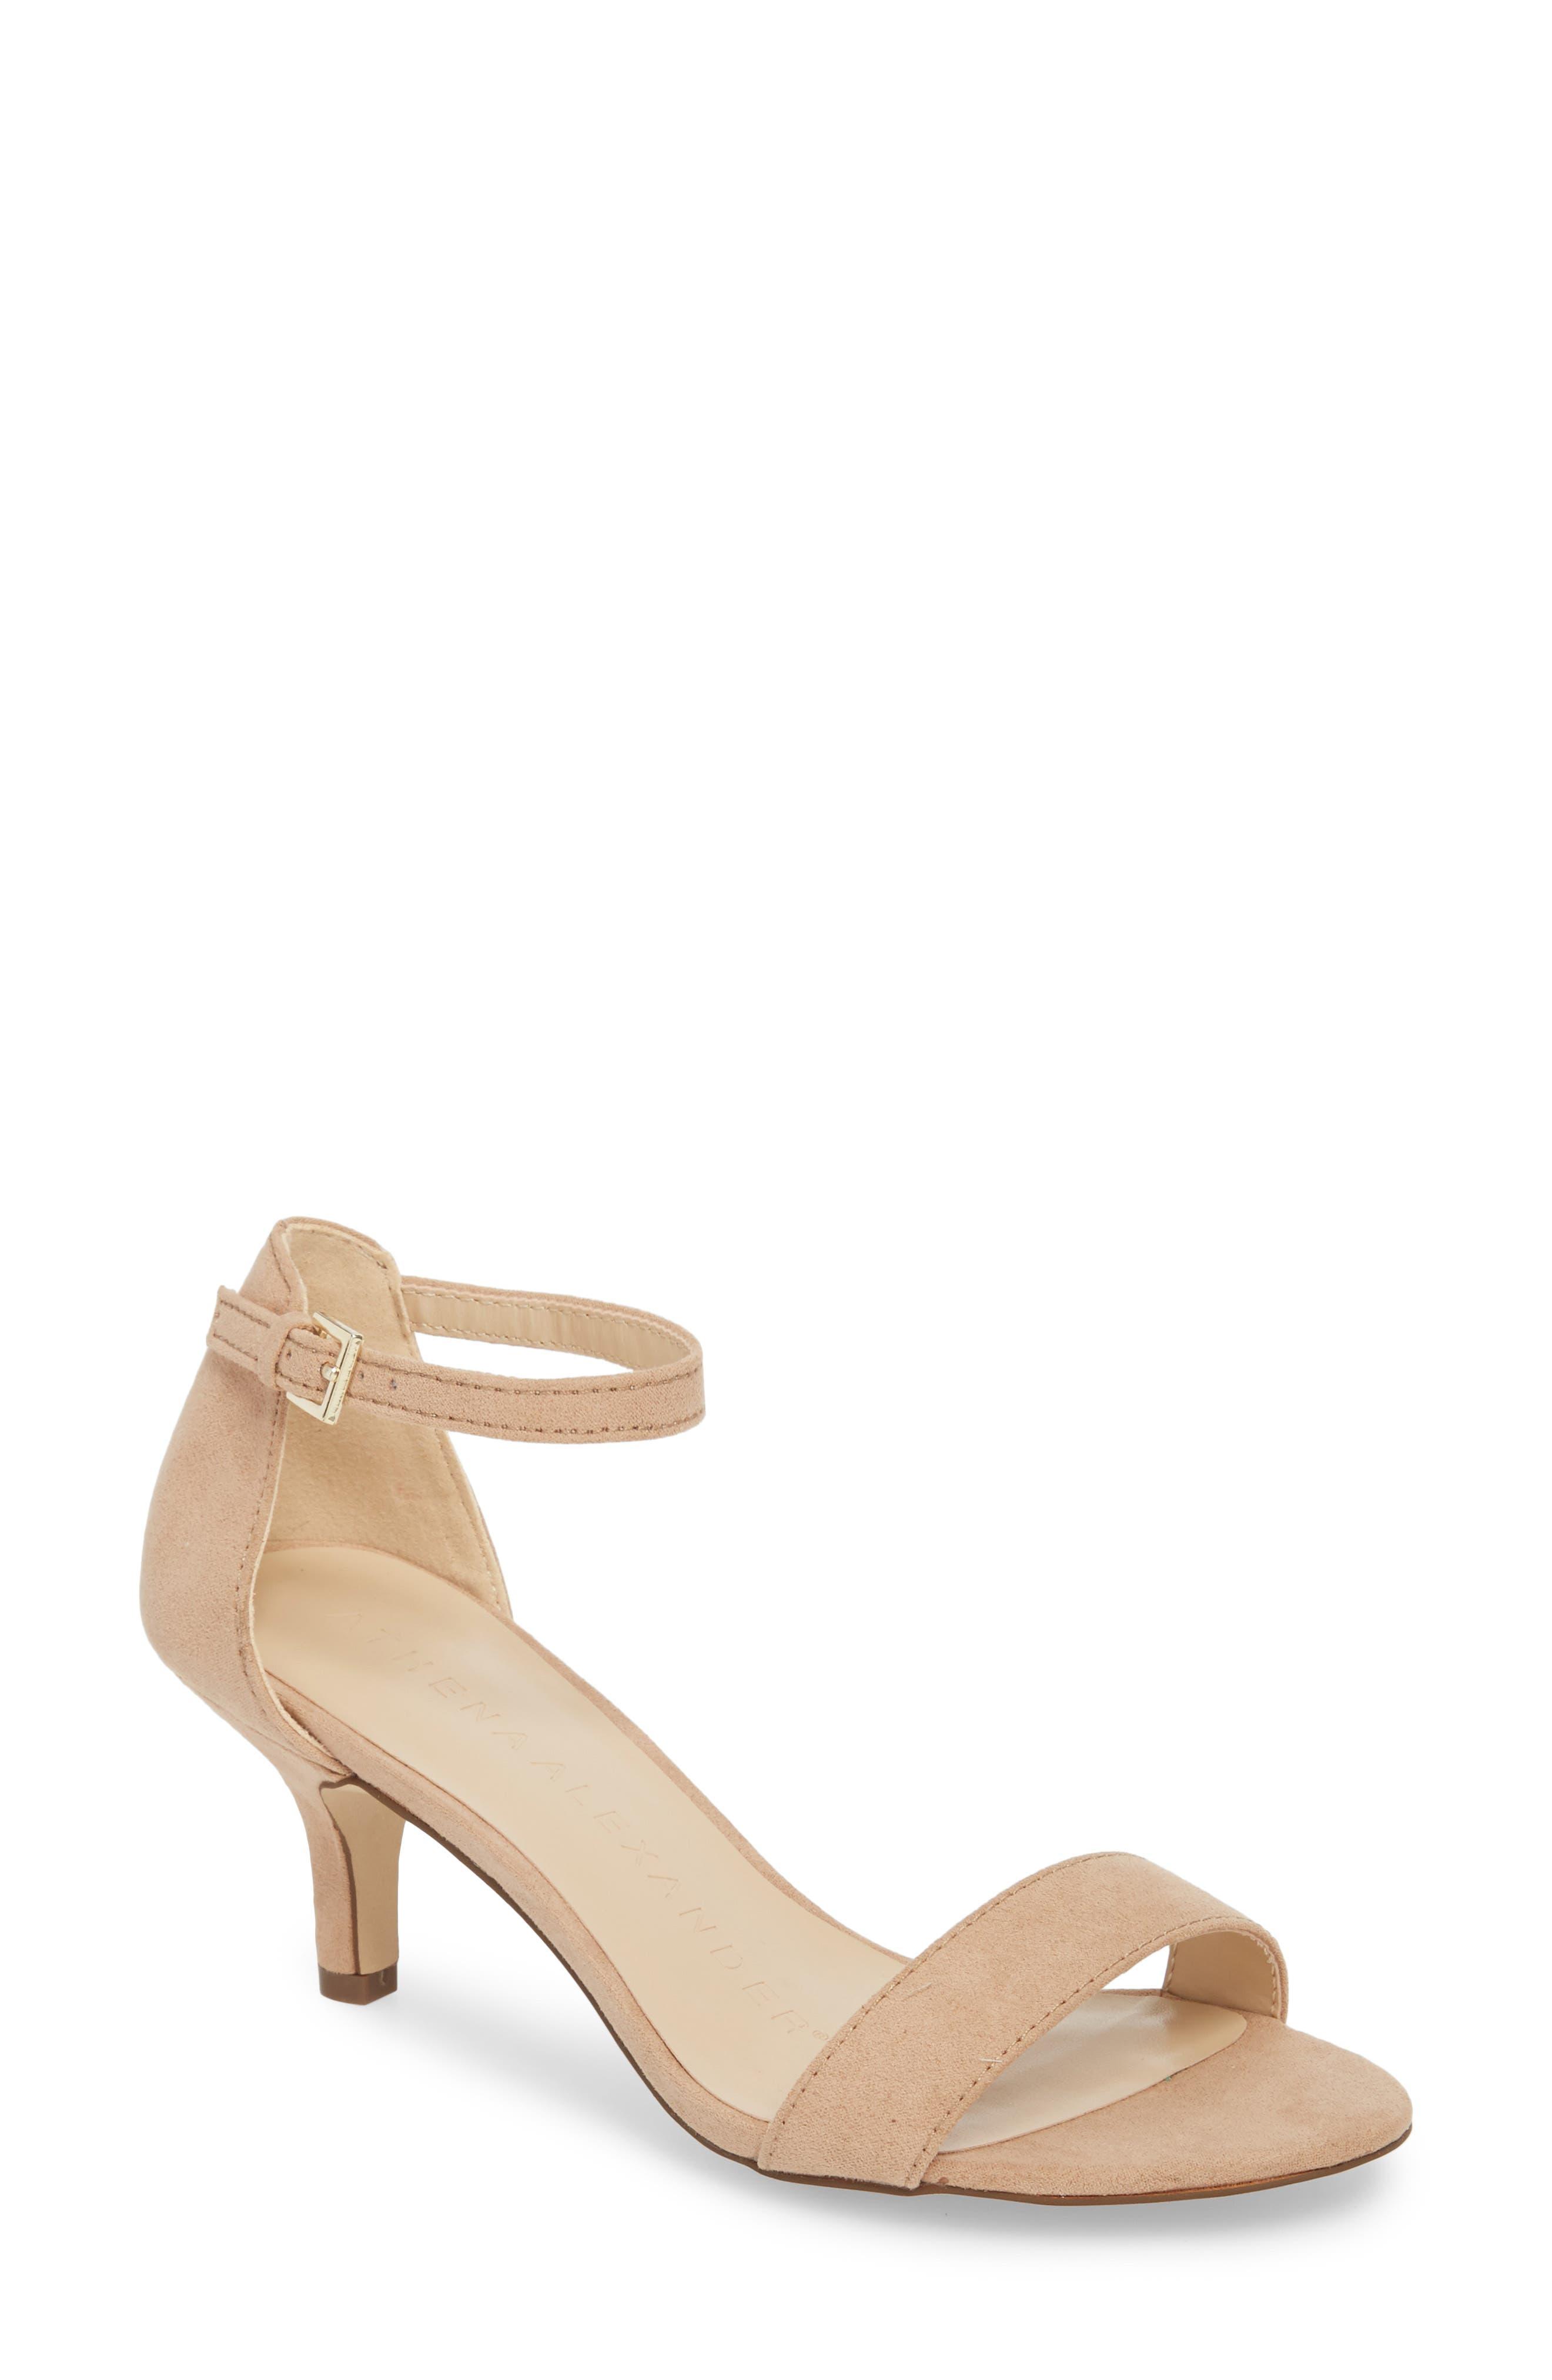 Womens Athena Alexander Women's Alinda Dress Sandal Sales Promotion Size 40